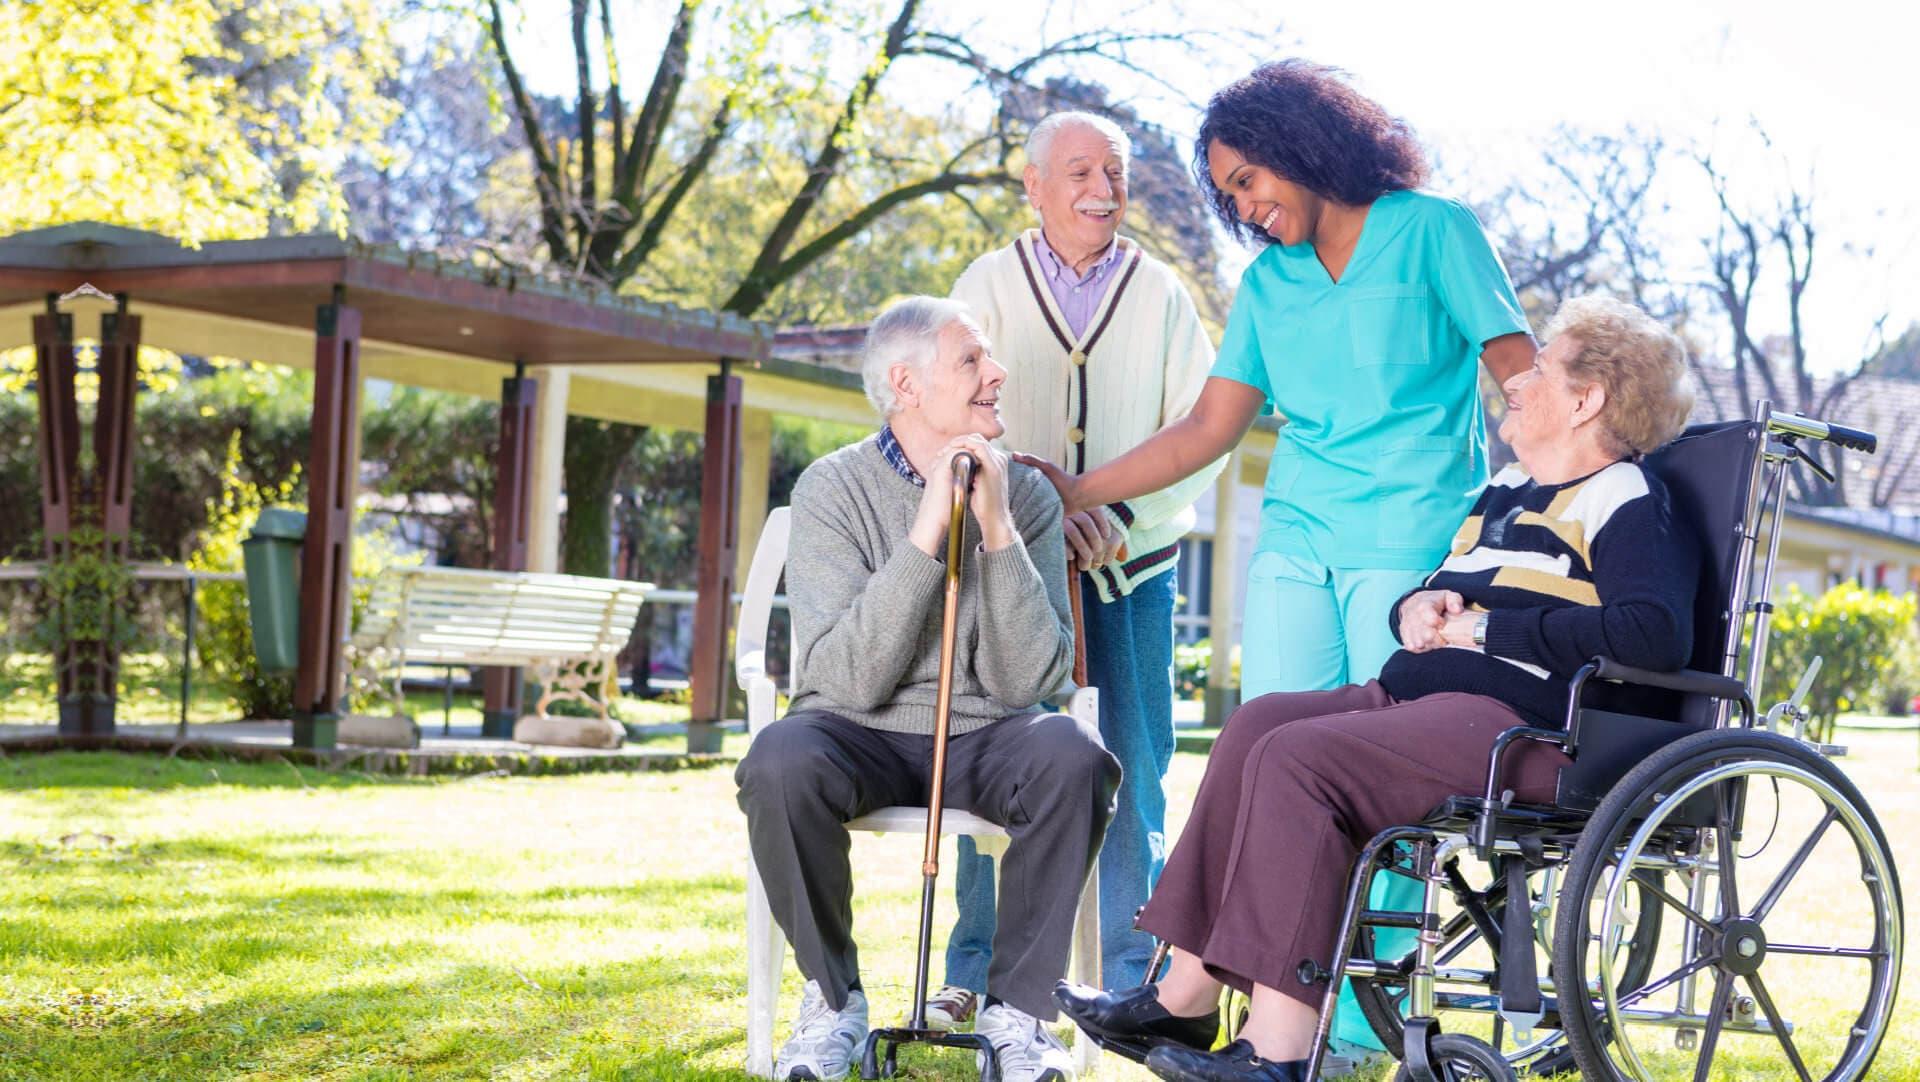 caregiver with her senior companions